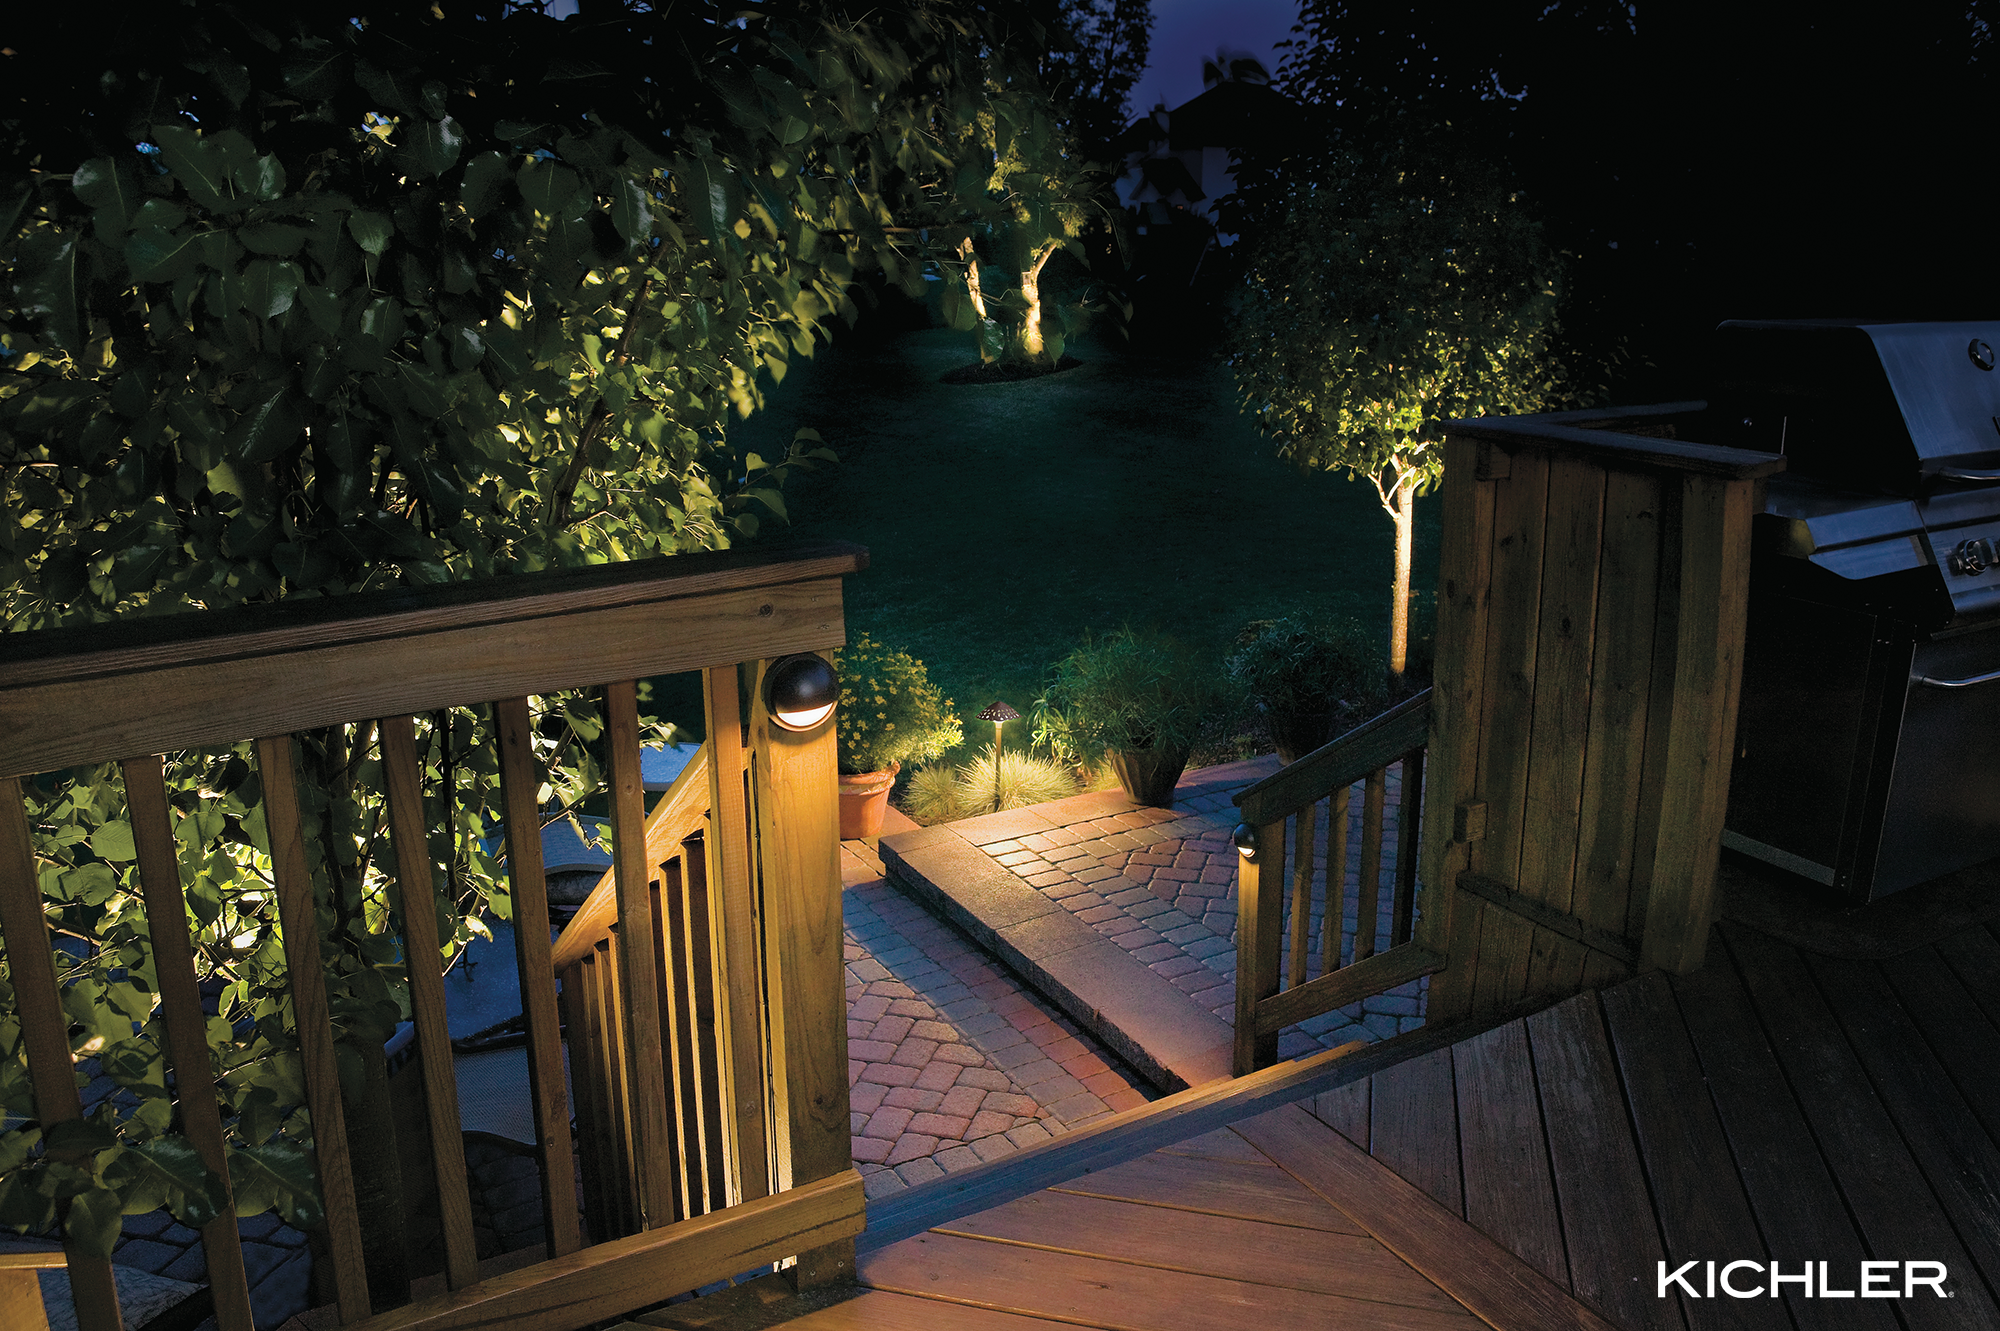 Kichler Landscape Deck Lights Provide Guided Illumination Ensuring Safety For All Who Like Kichler Outdoor Lighting Outdoor Lighting Modern Landscape Lighting